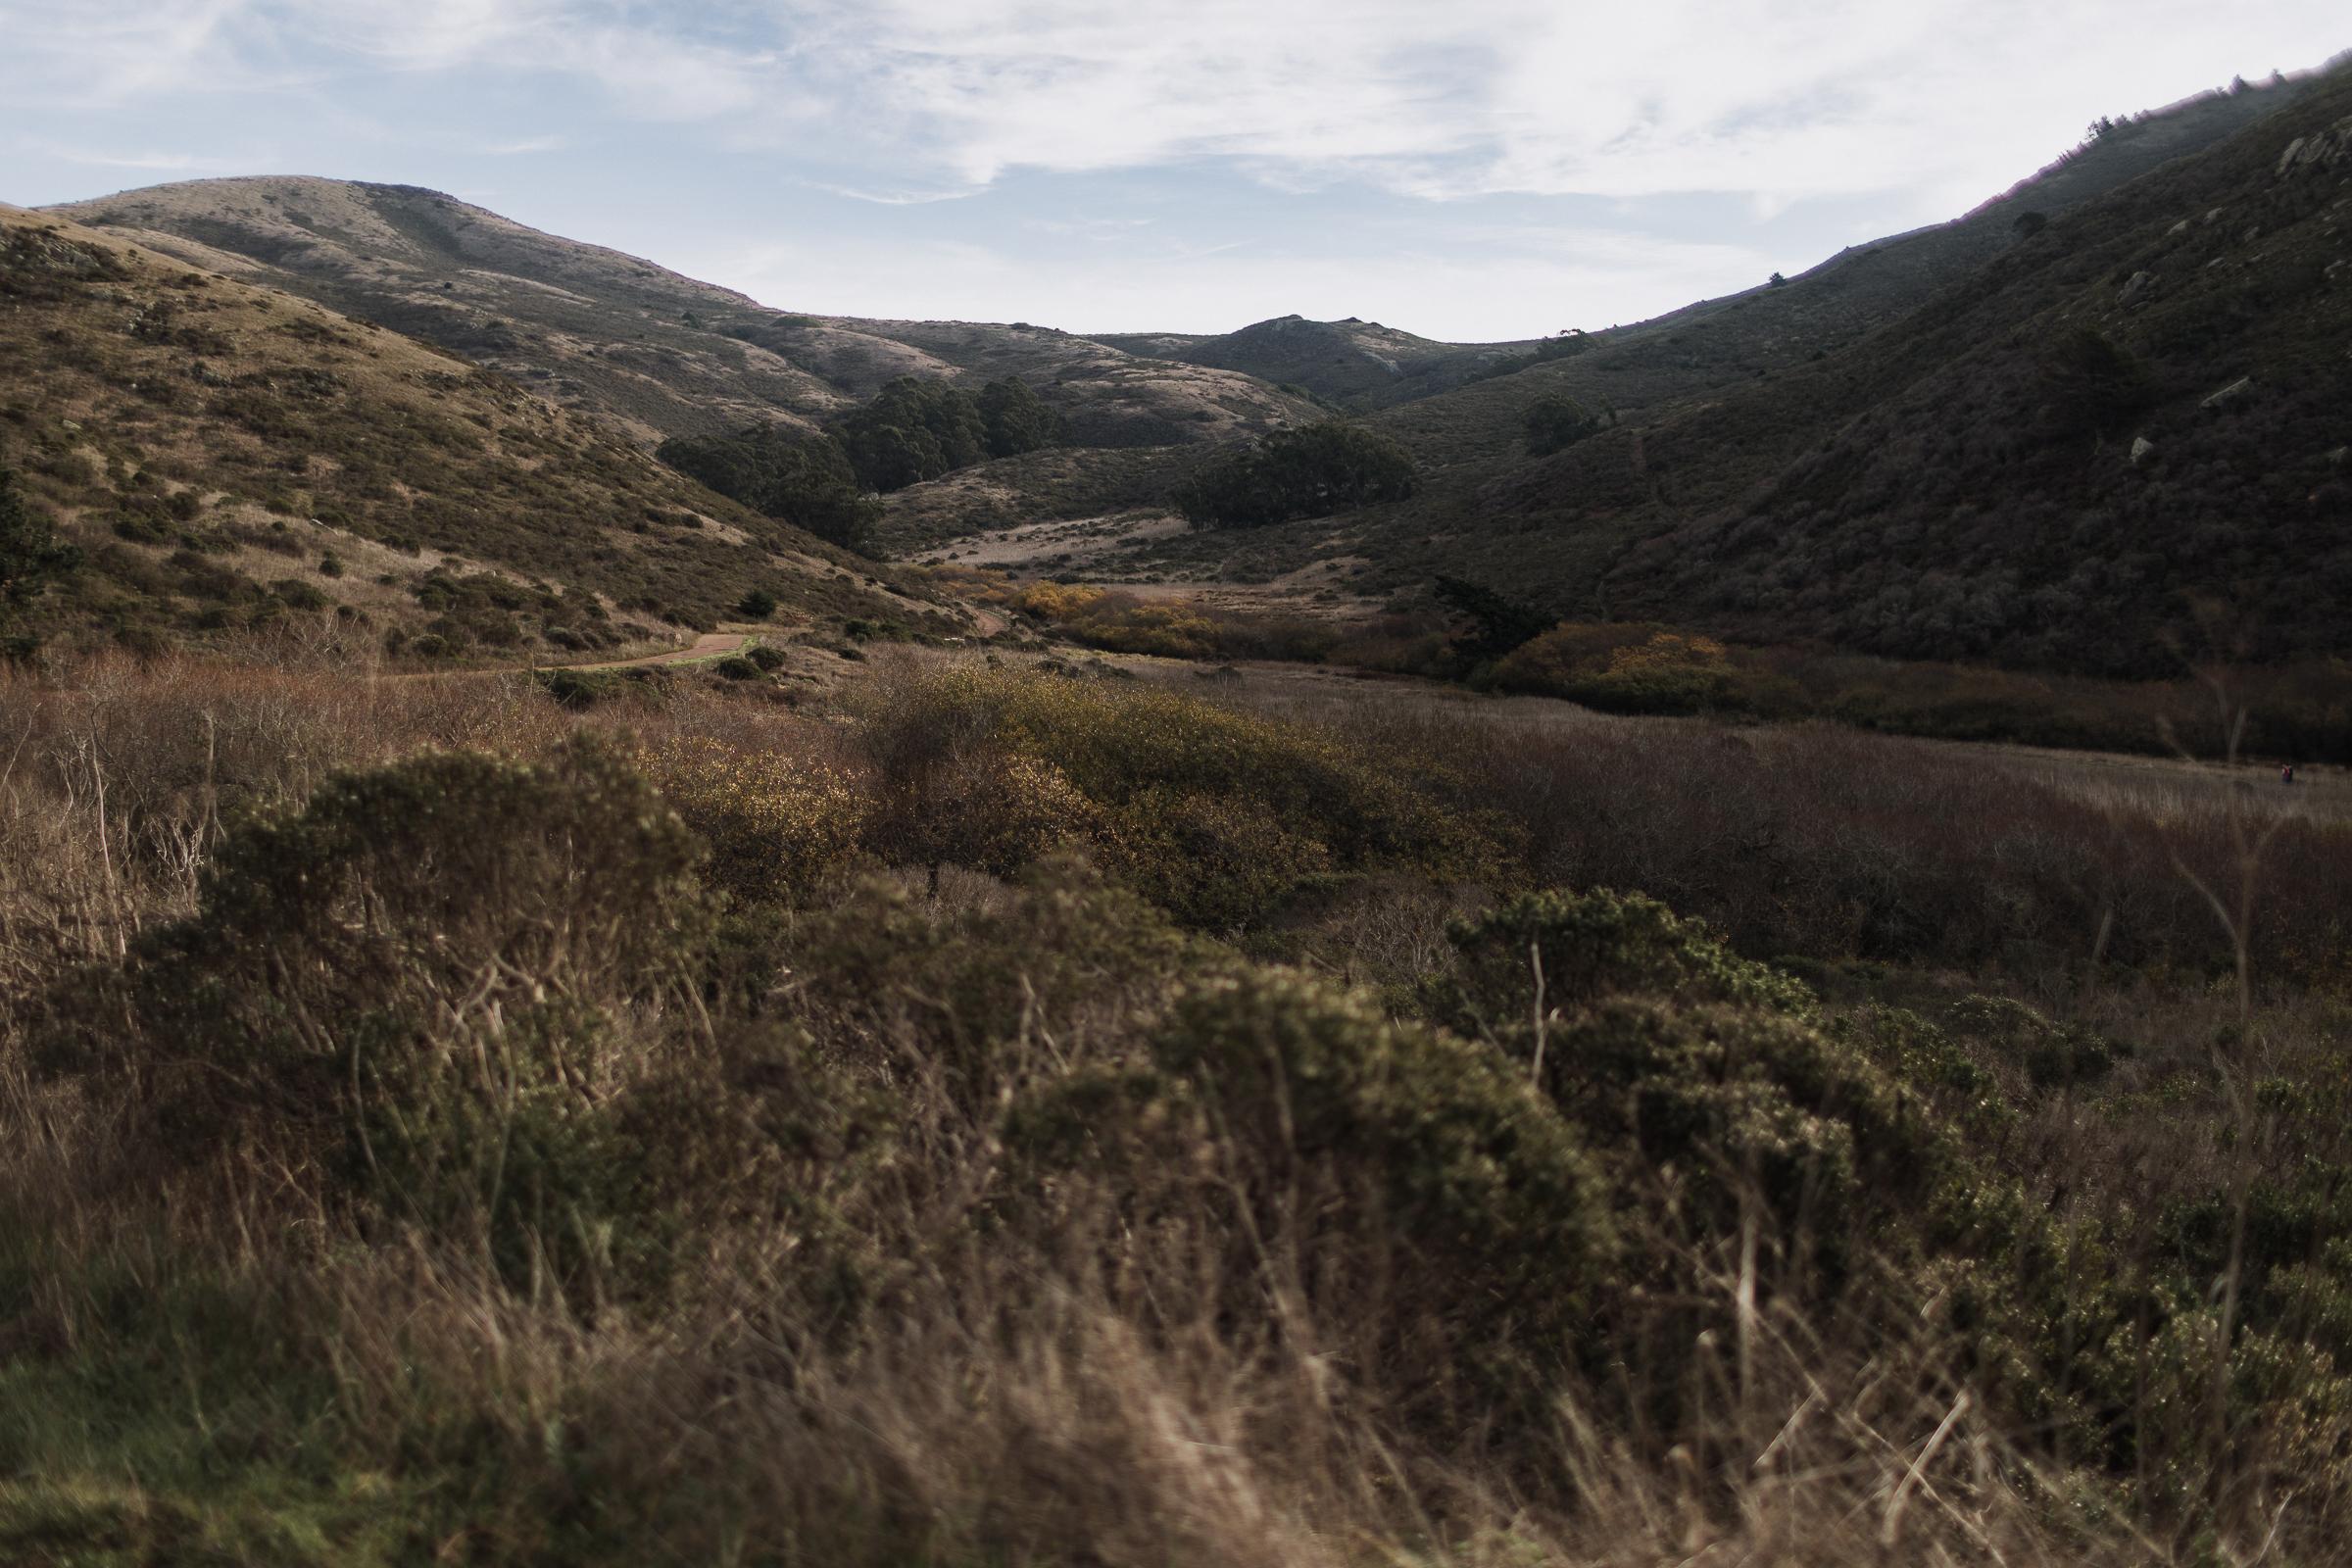 gretchen_gause_tennessee_valley_trail_engagement_photo_california-52.jpg